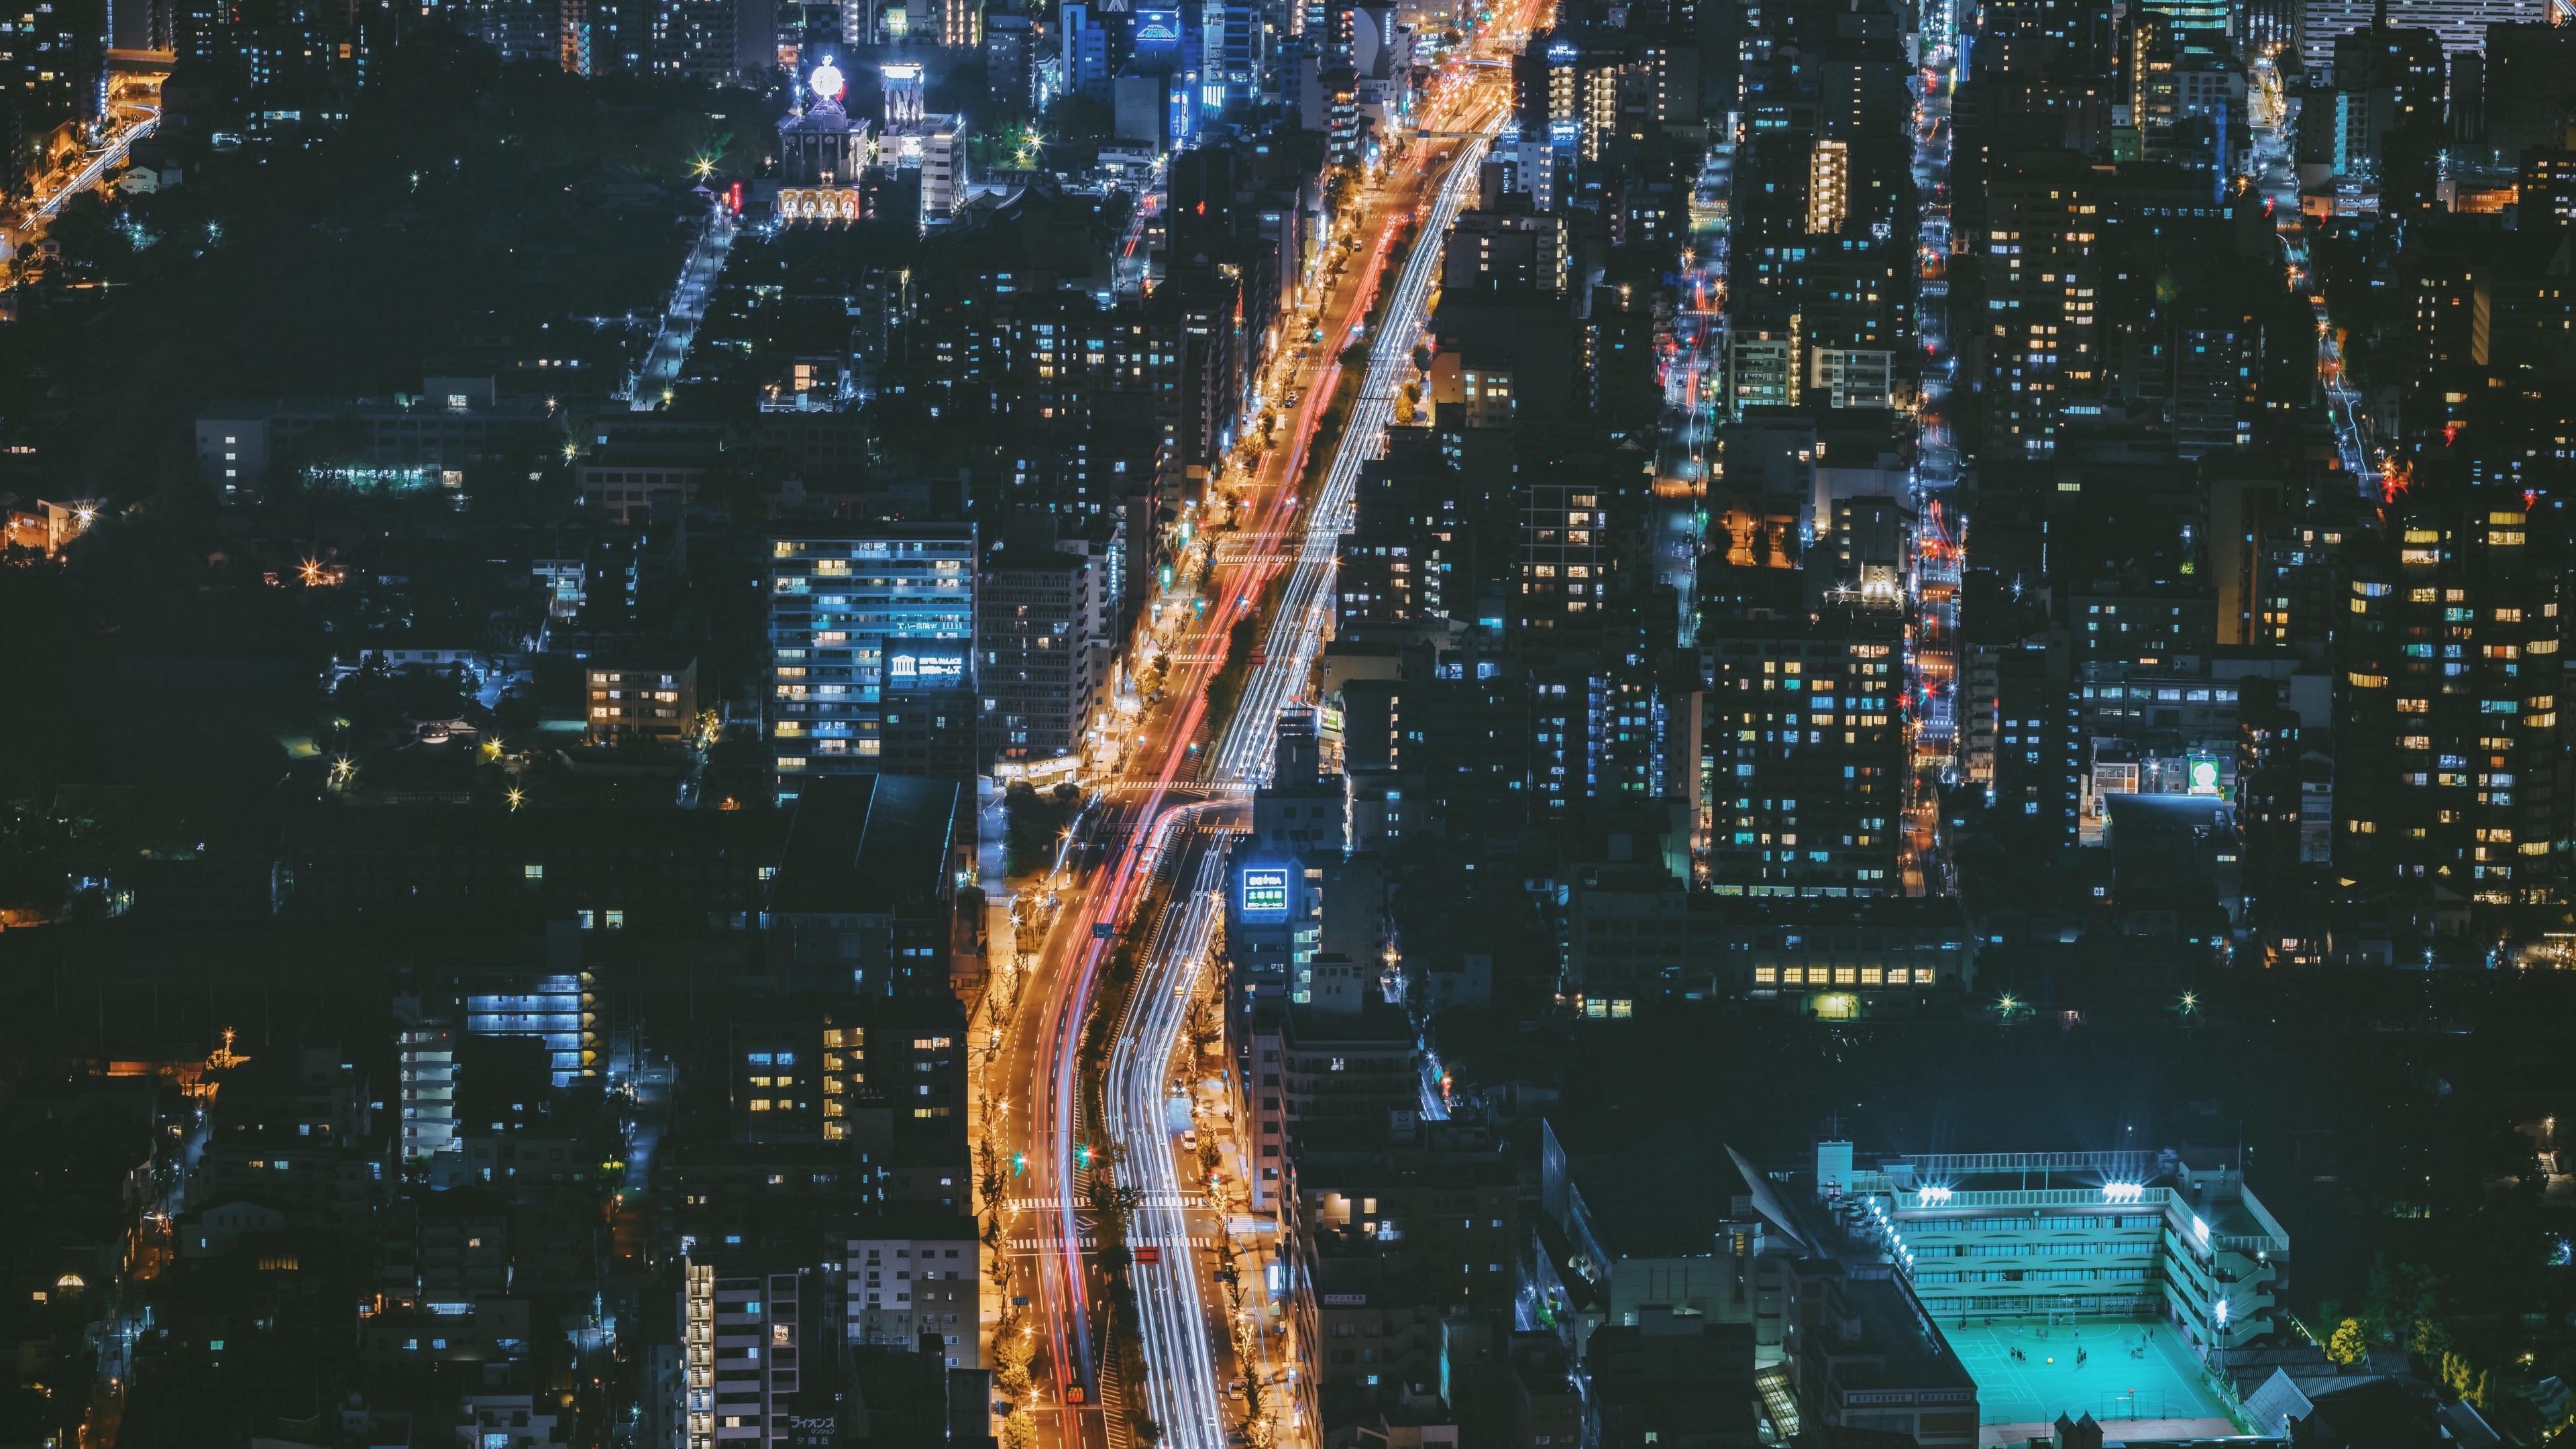 night city view from above osaka city lights japan 4k 1538066263 - night city, view from above, osaka, city lights, japan 4k - view from above, osaka, night city